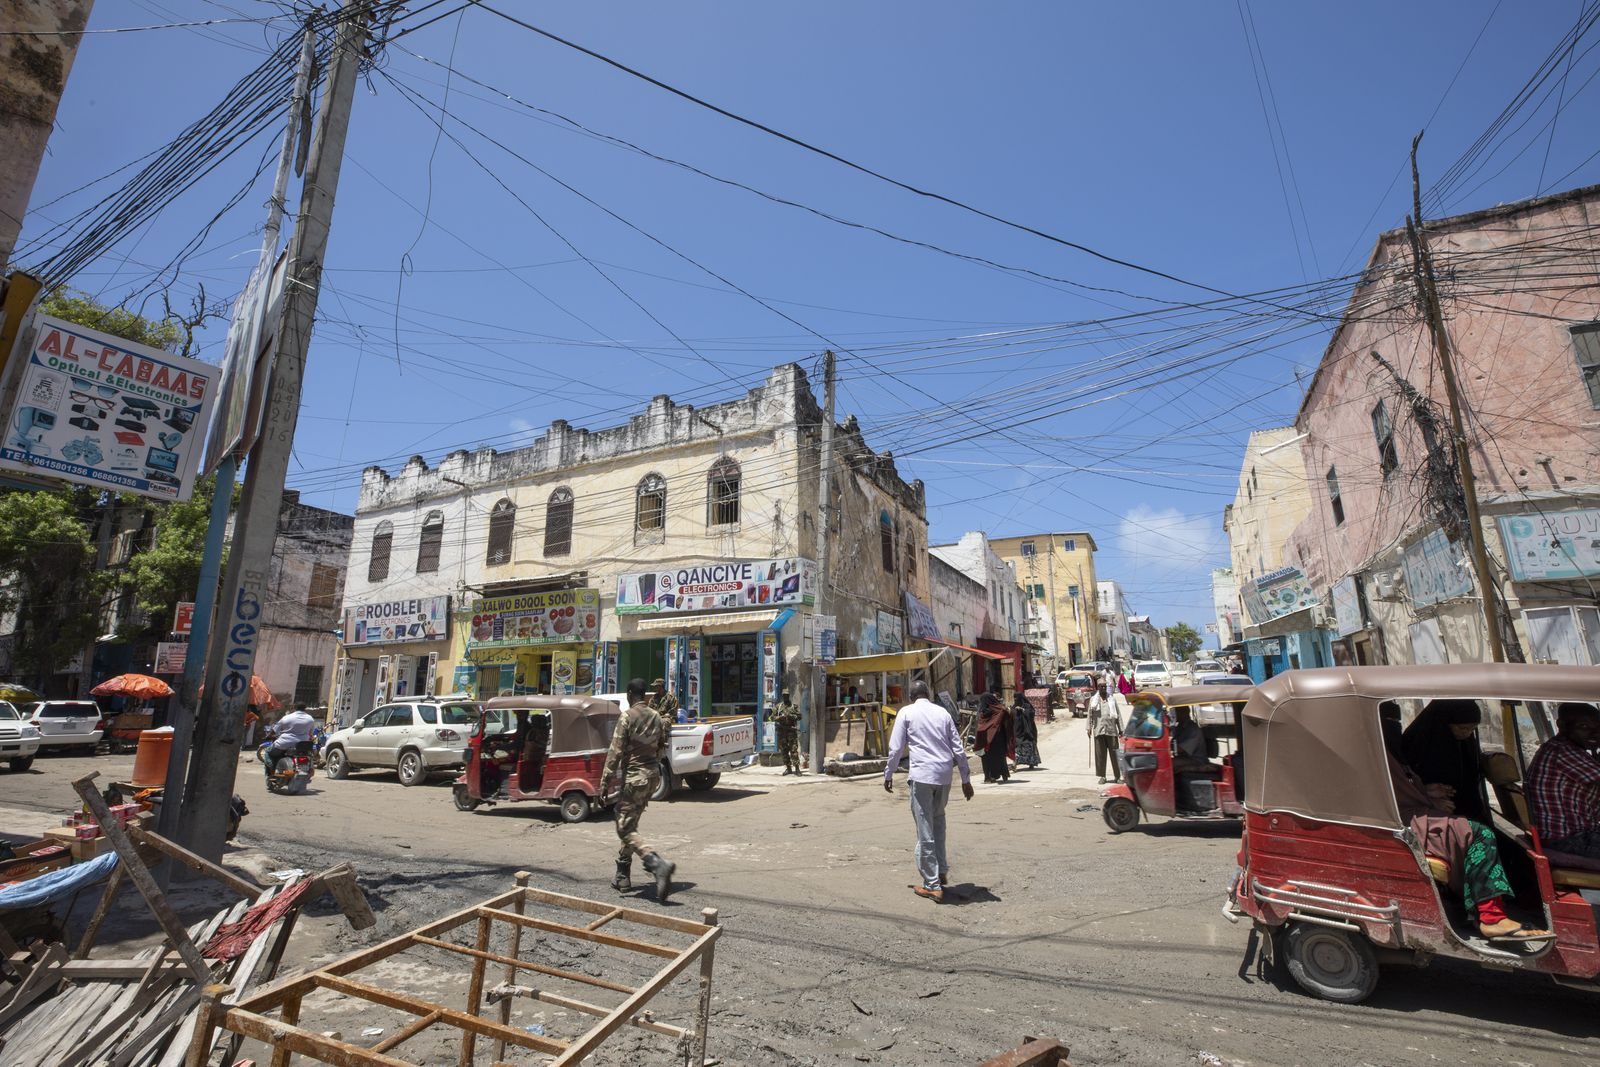 Commercial life in Somalia's Mogadishu